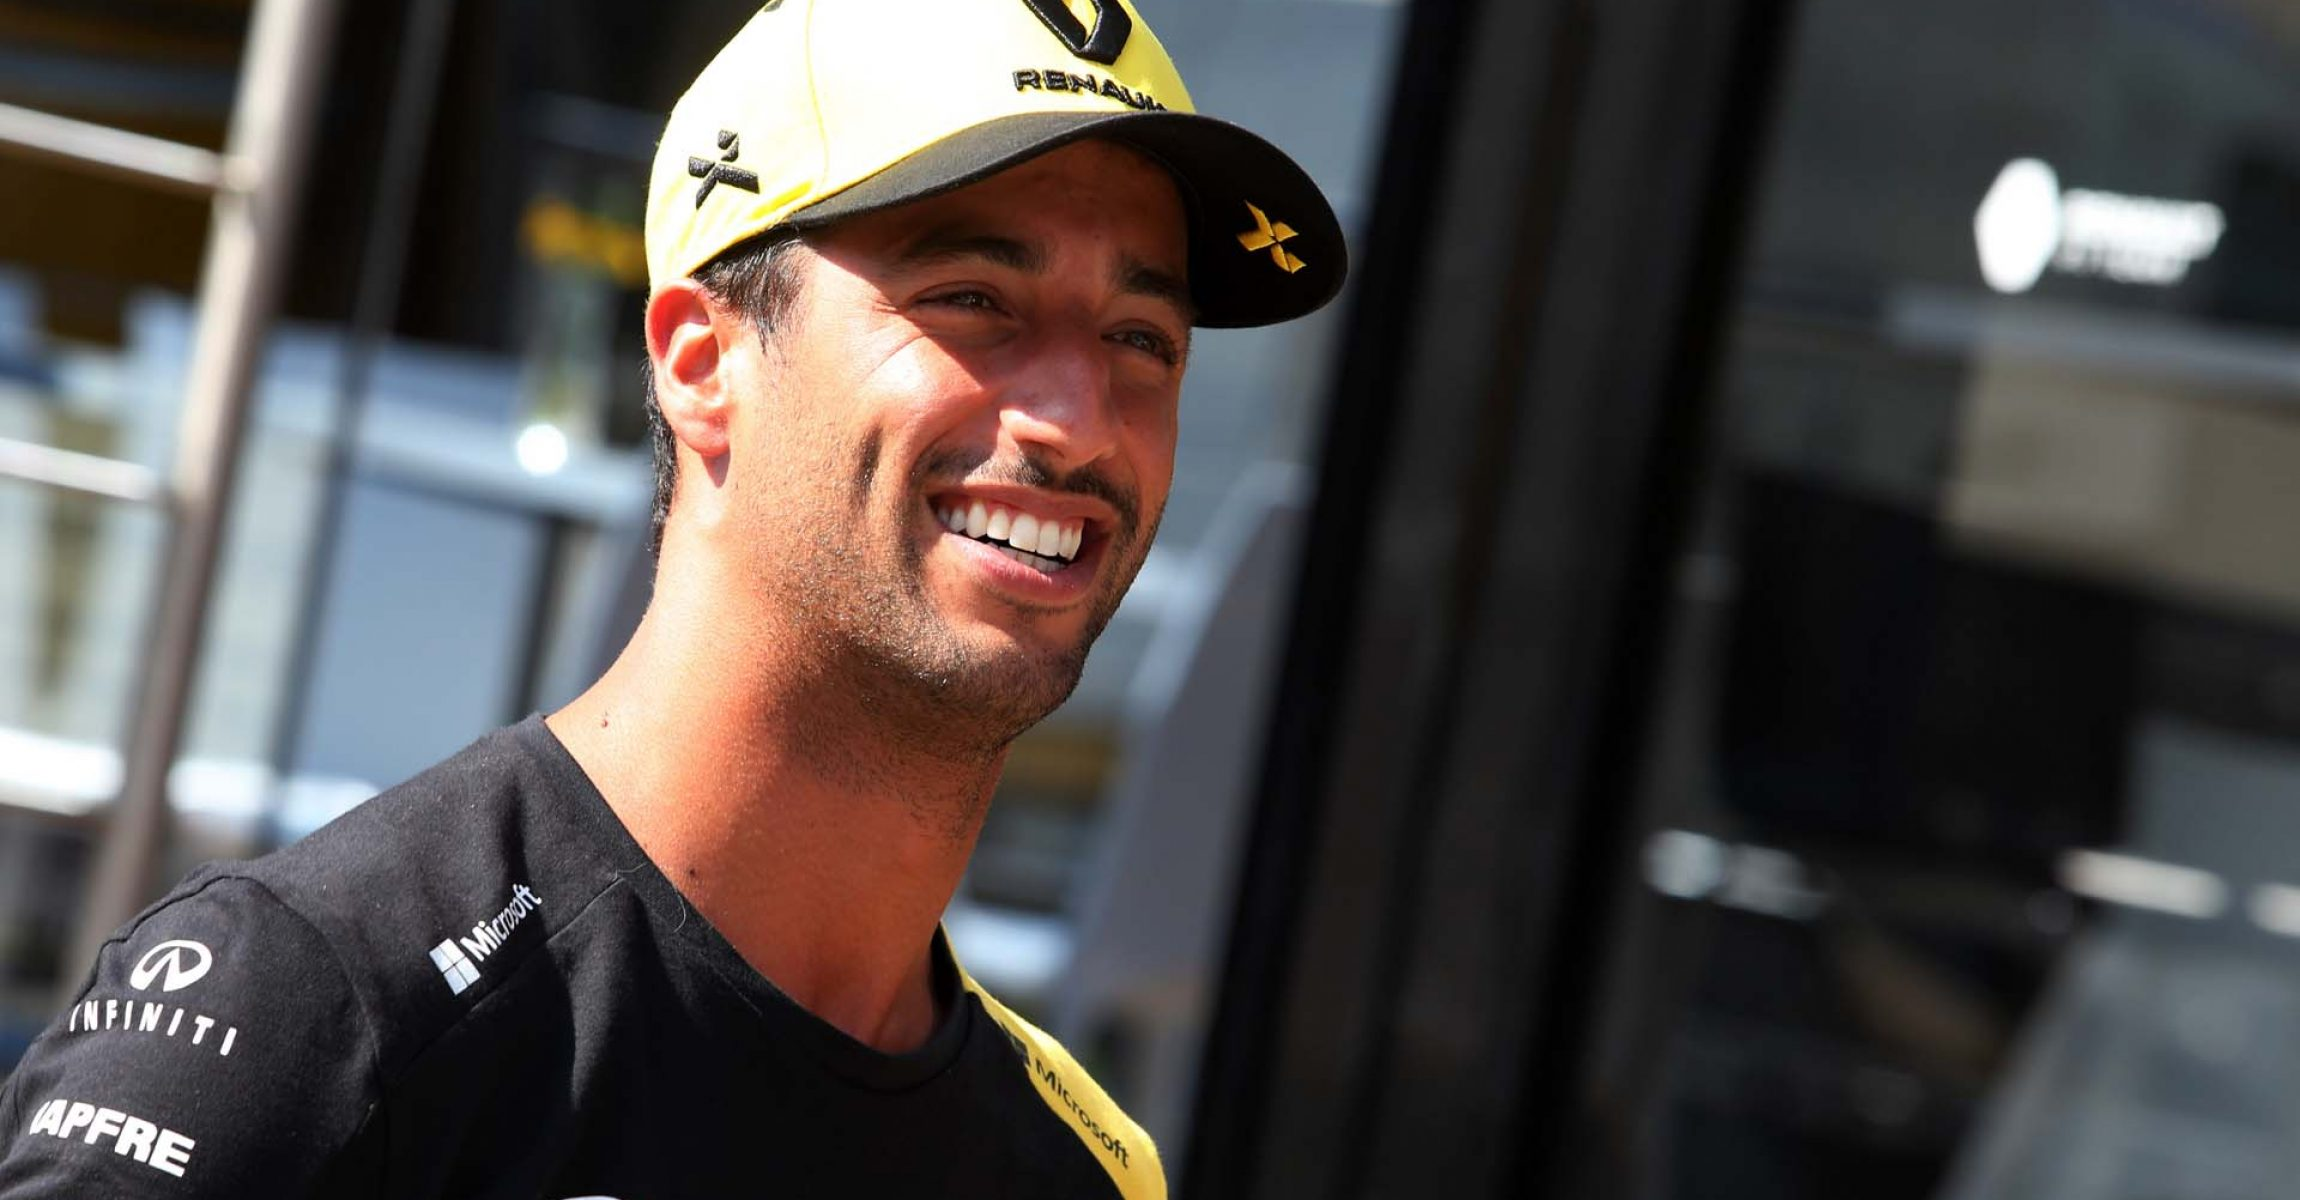 Daniel Ricciardo (AUS) Renault F1 Team. Hungarian Grand Prix, Thursday 1st August 2019. Budapest, Hungary.